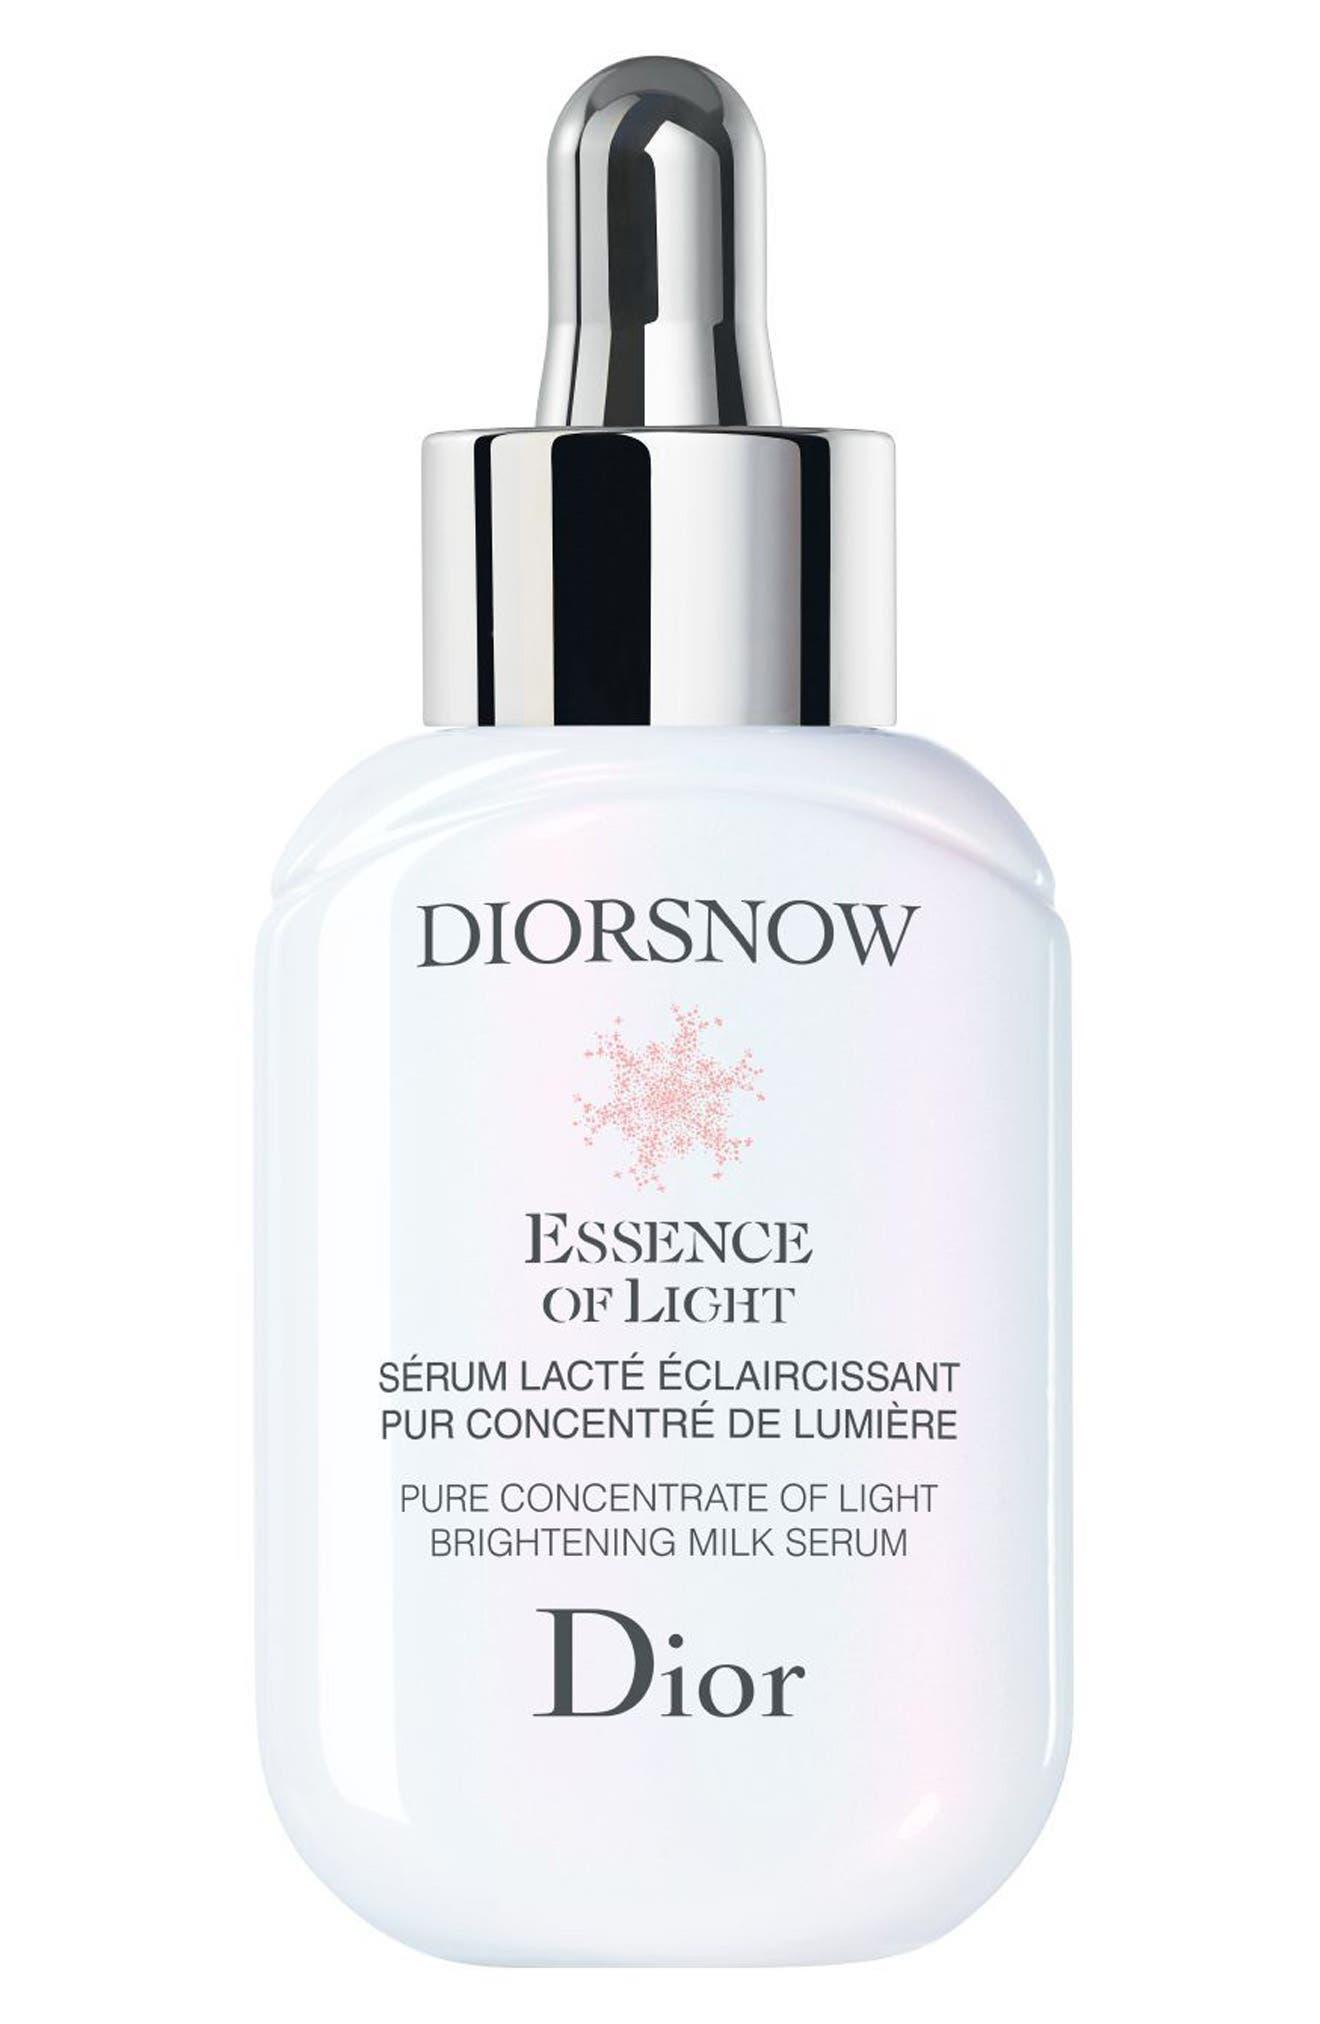 Diorsnow Essence of Light Brightening Milk Serum,                         Main,                         color, No Color